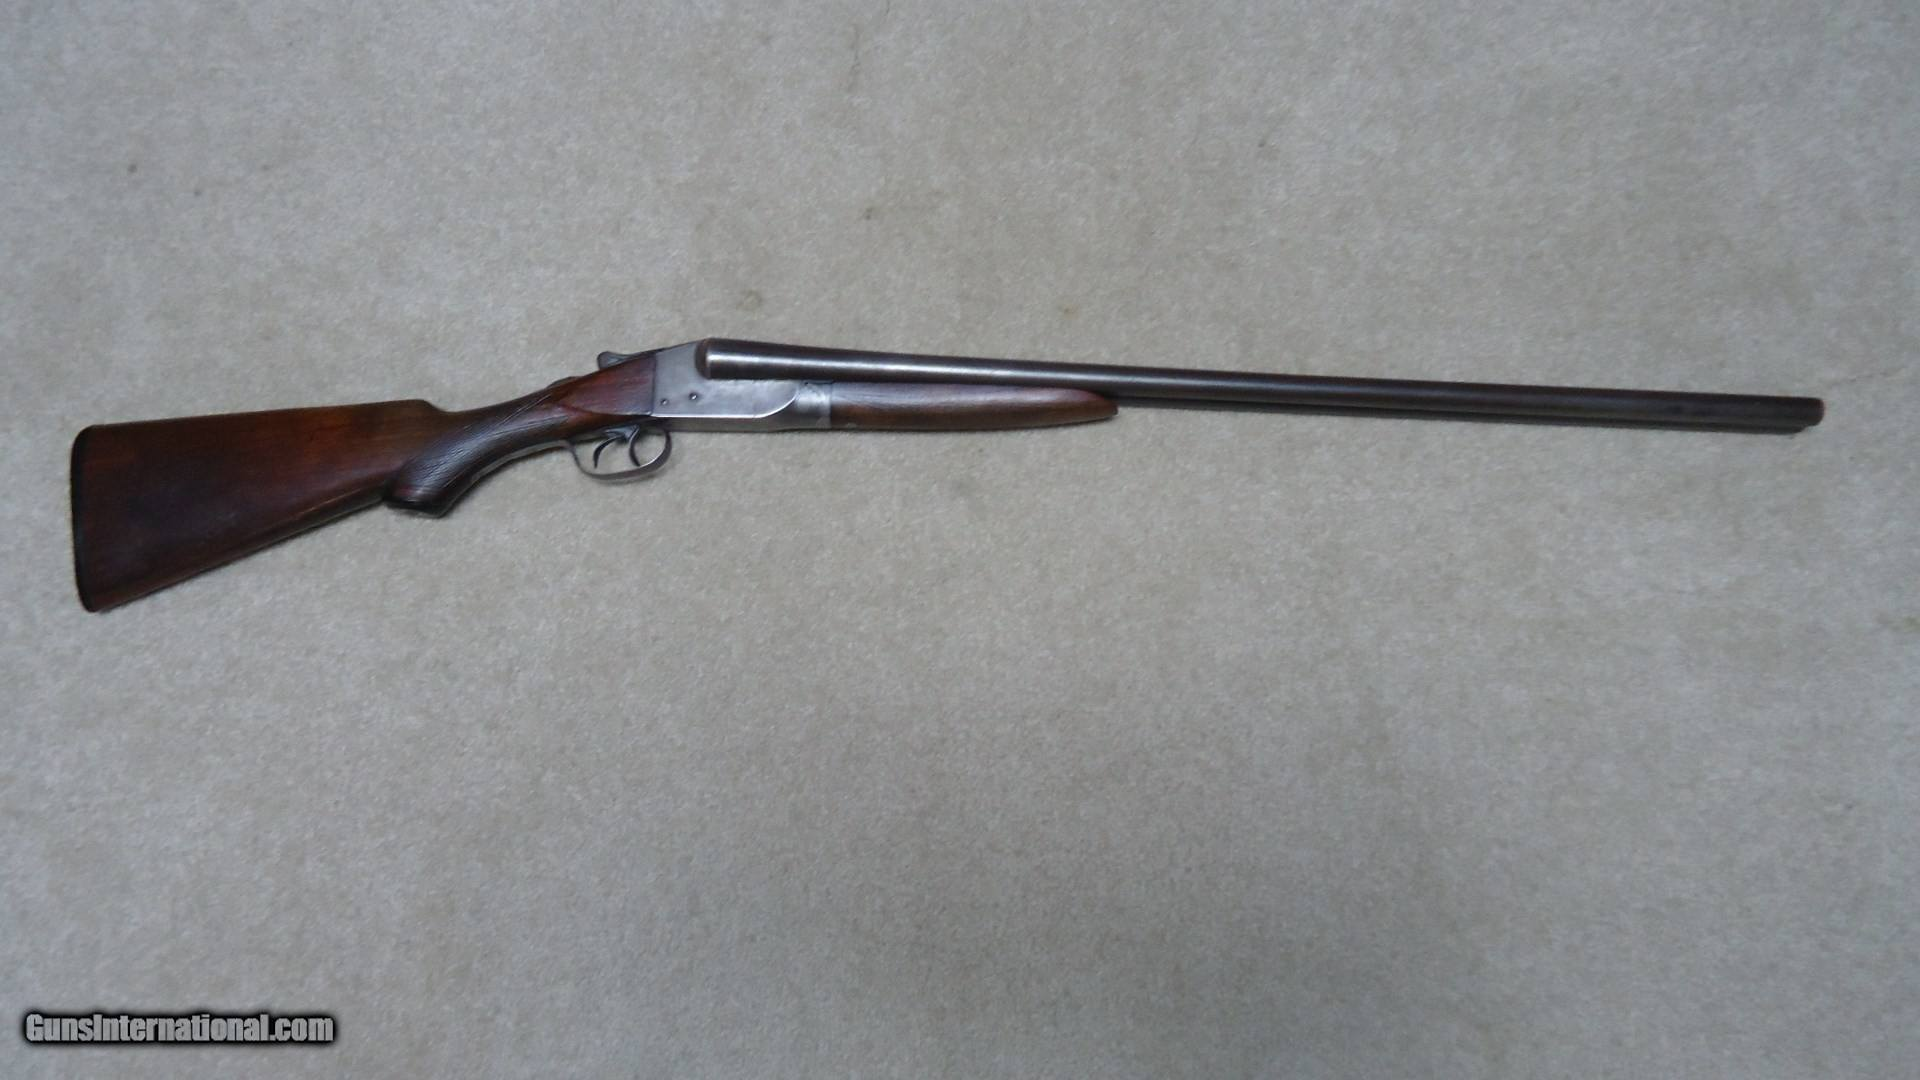 CLASSIC ITHACA DOUBLE BARREL SHOTGUN, SCARCE 16 GAUGE WITH 28